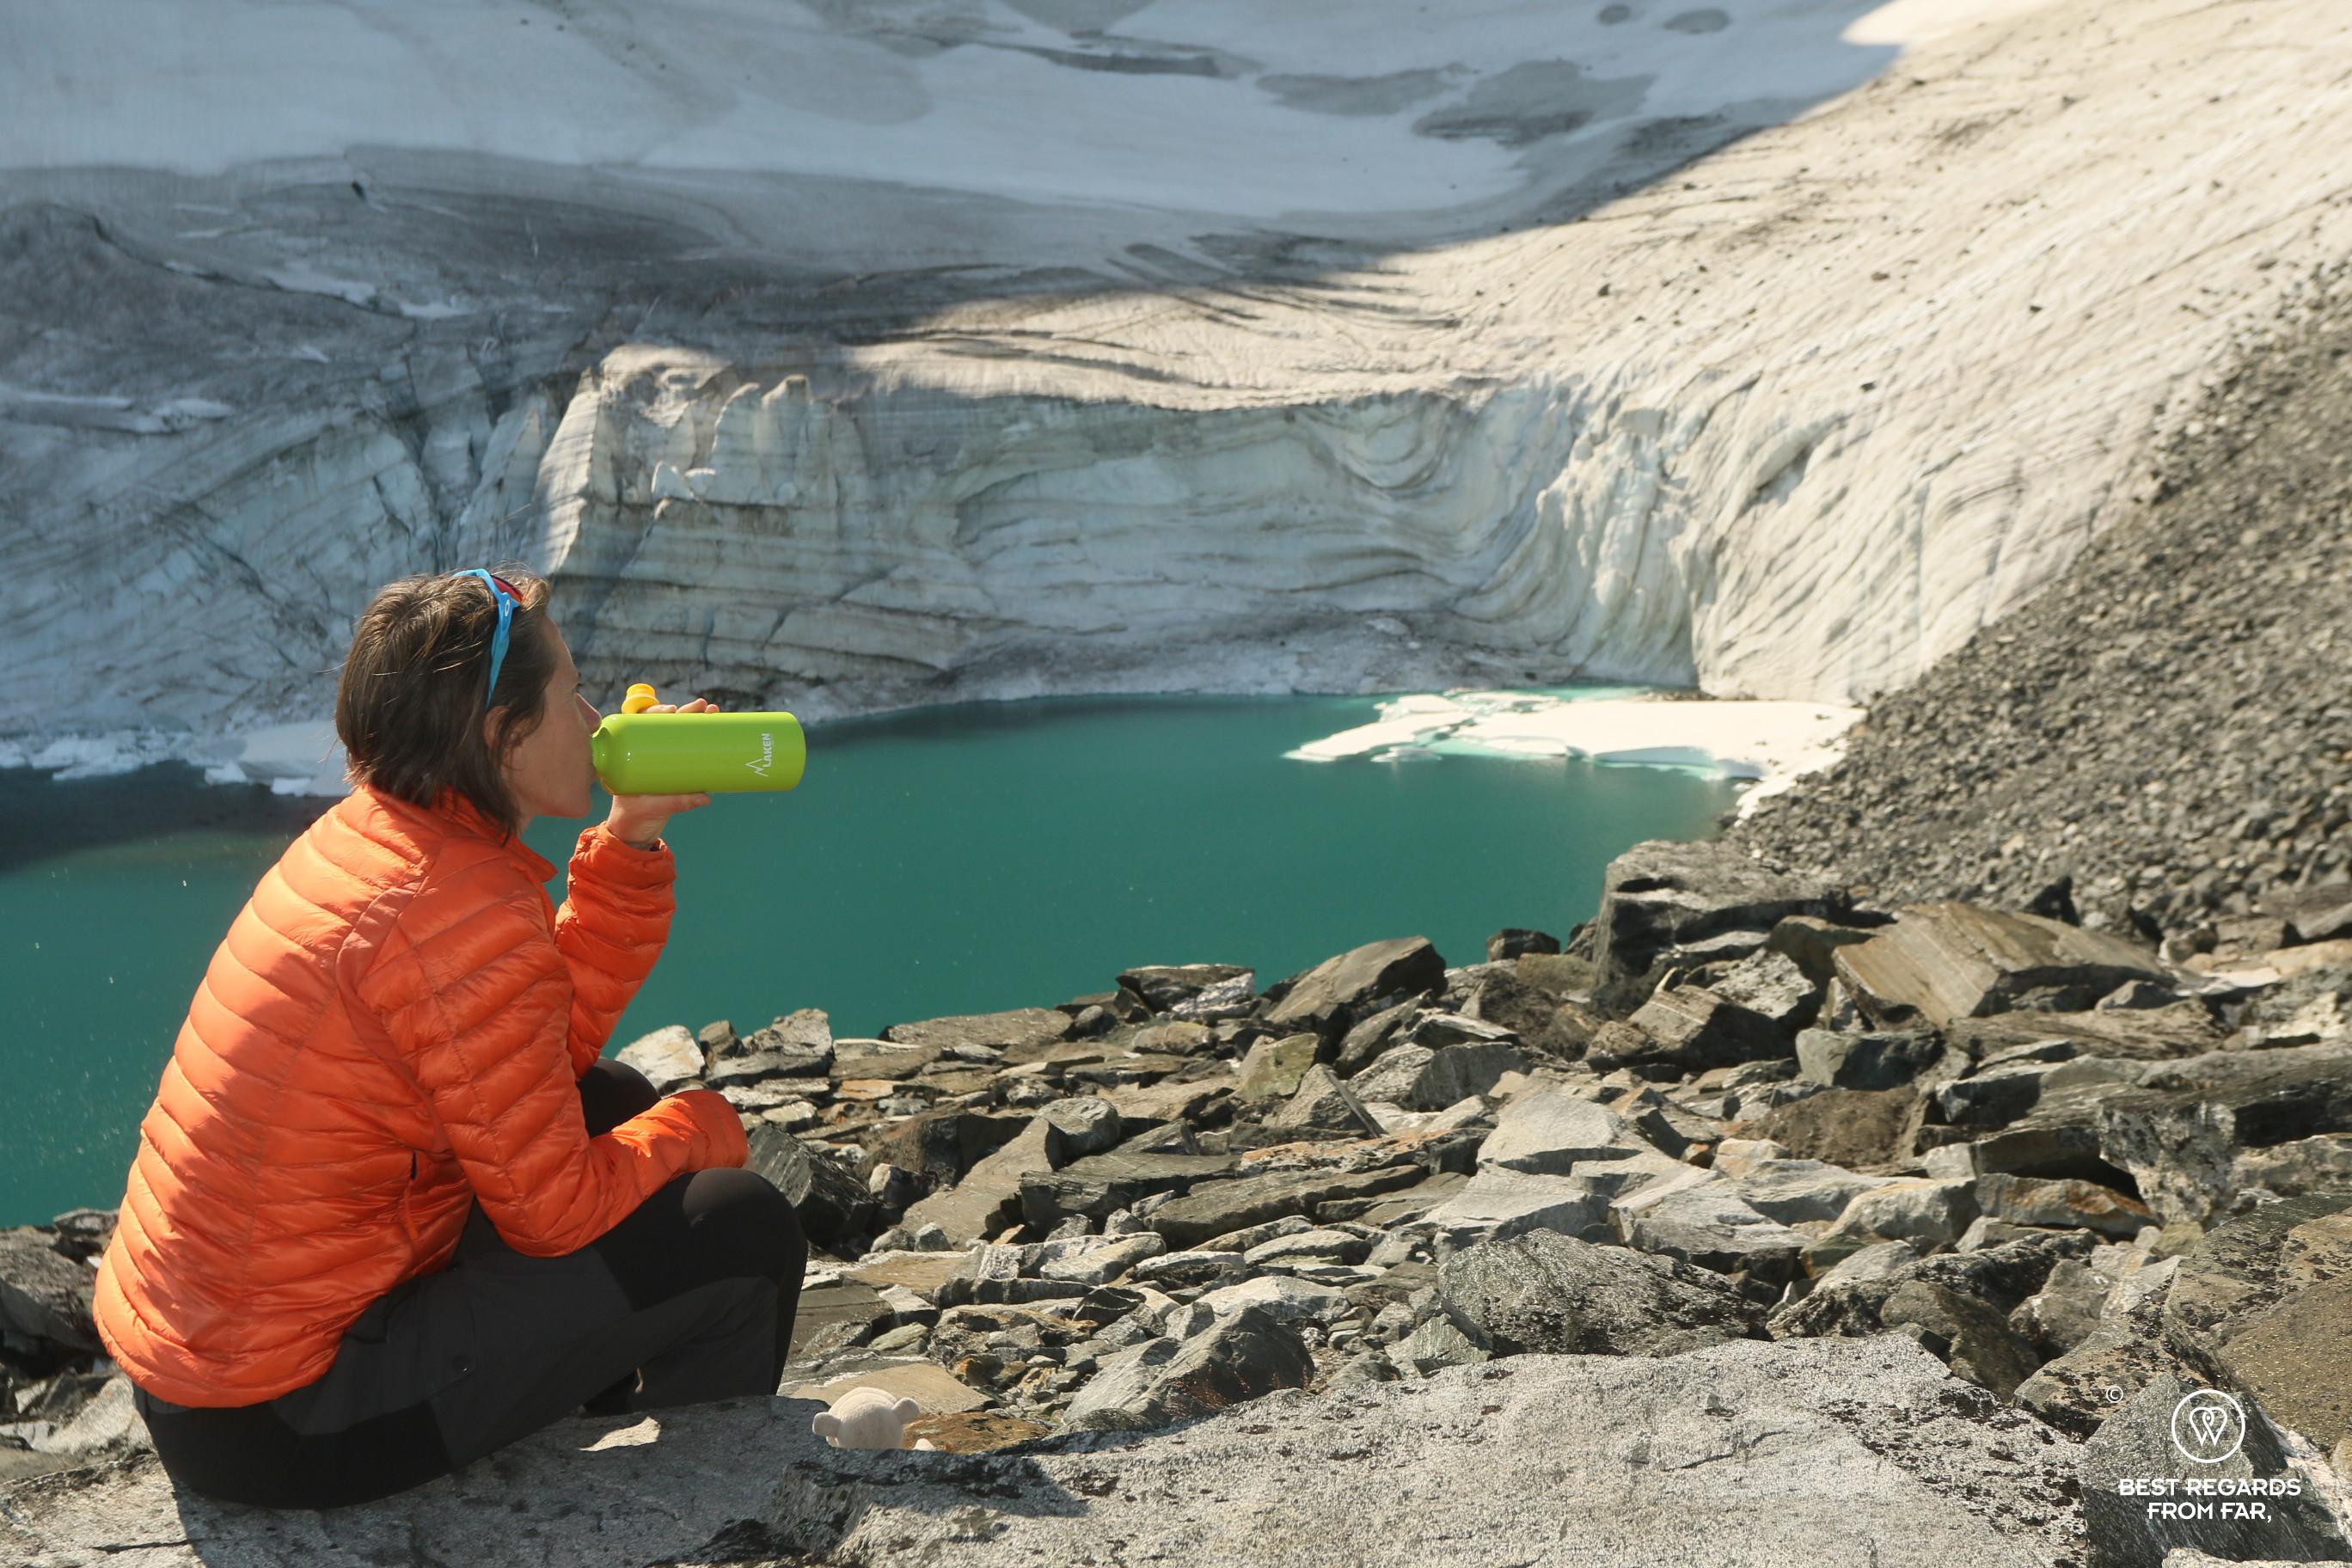 Author Claire Lessiau taking a break at a glacier lake